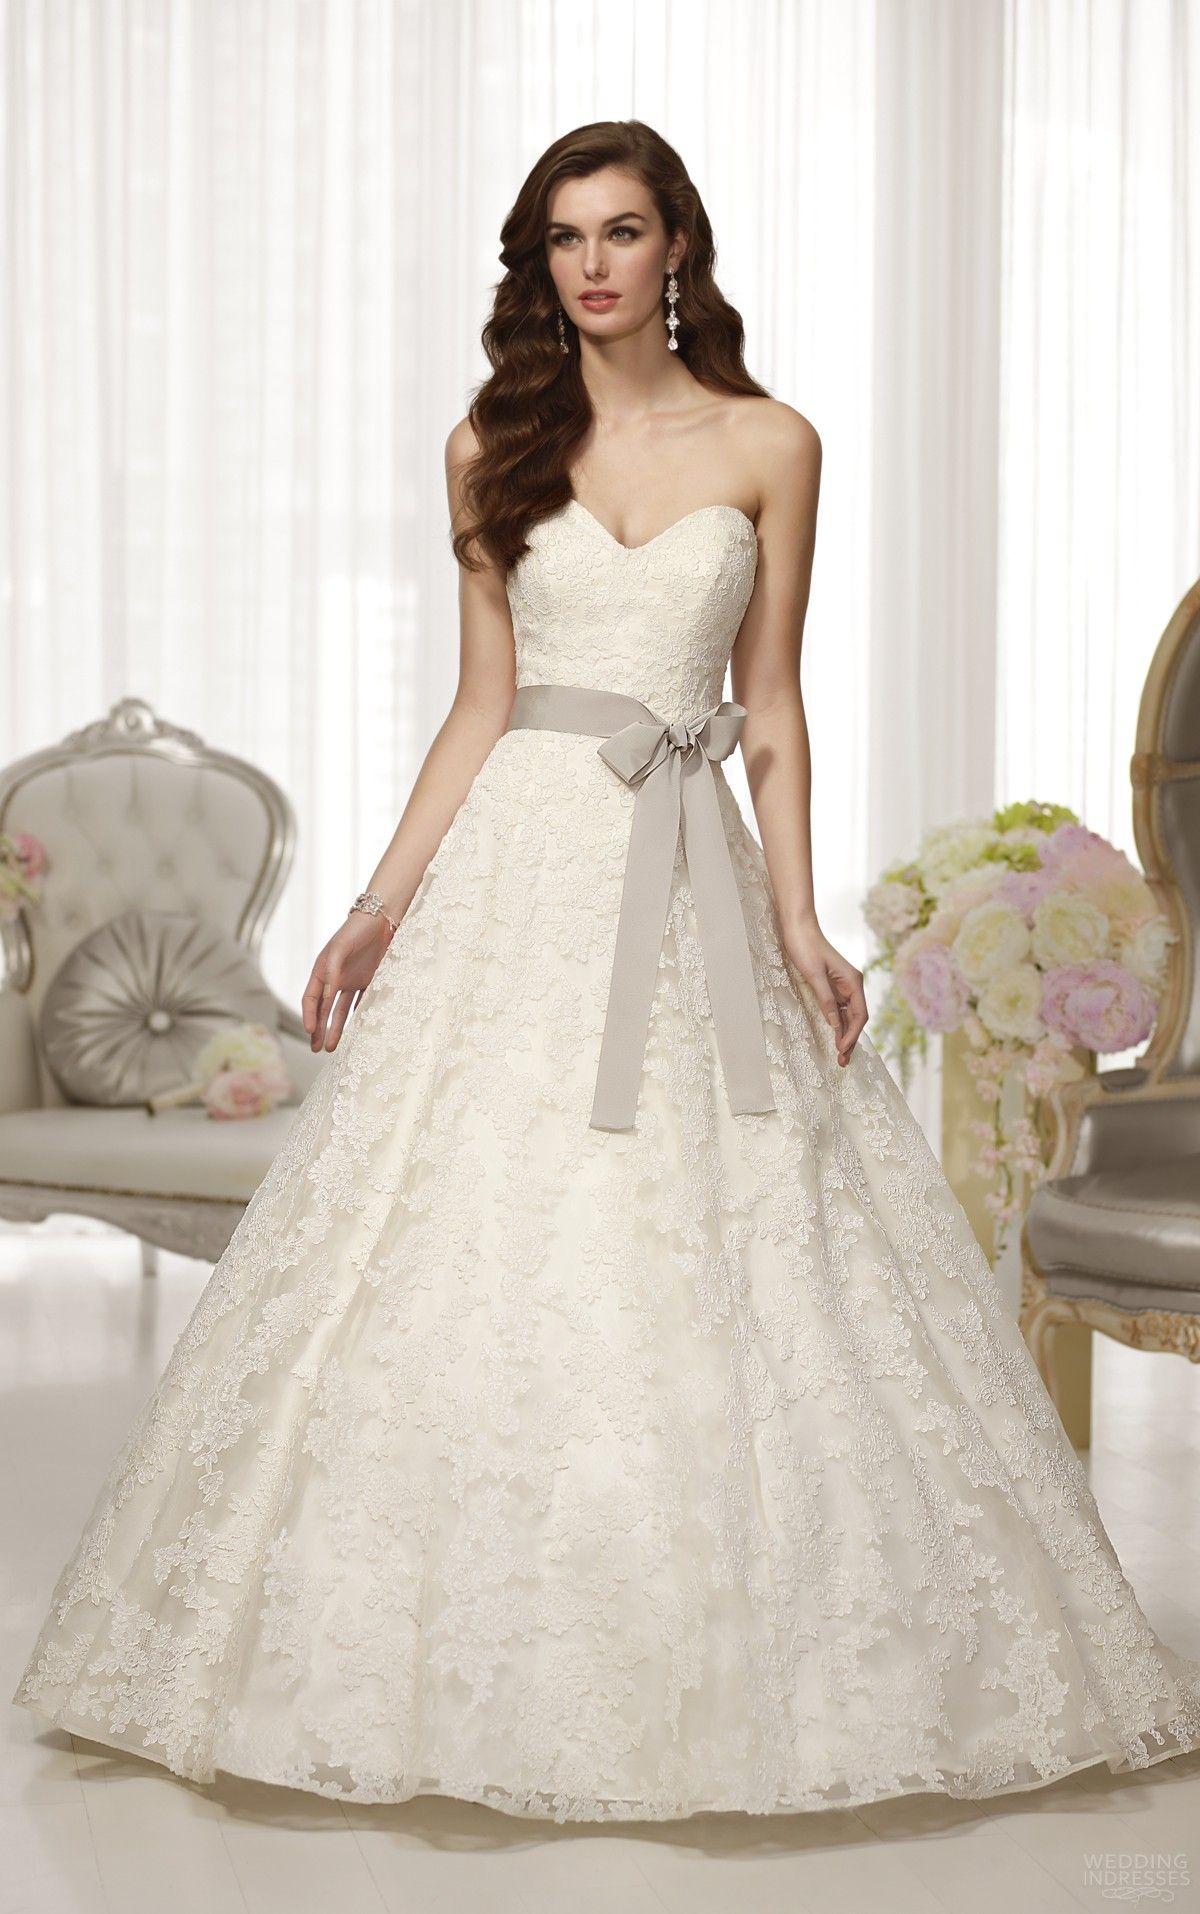 lace over organza line sweetheart wedding dress | Wedding dresses ...